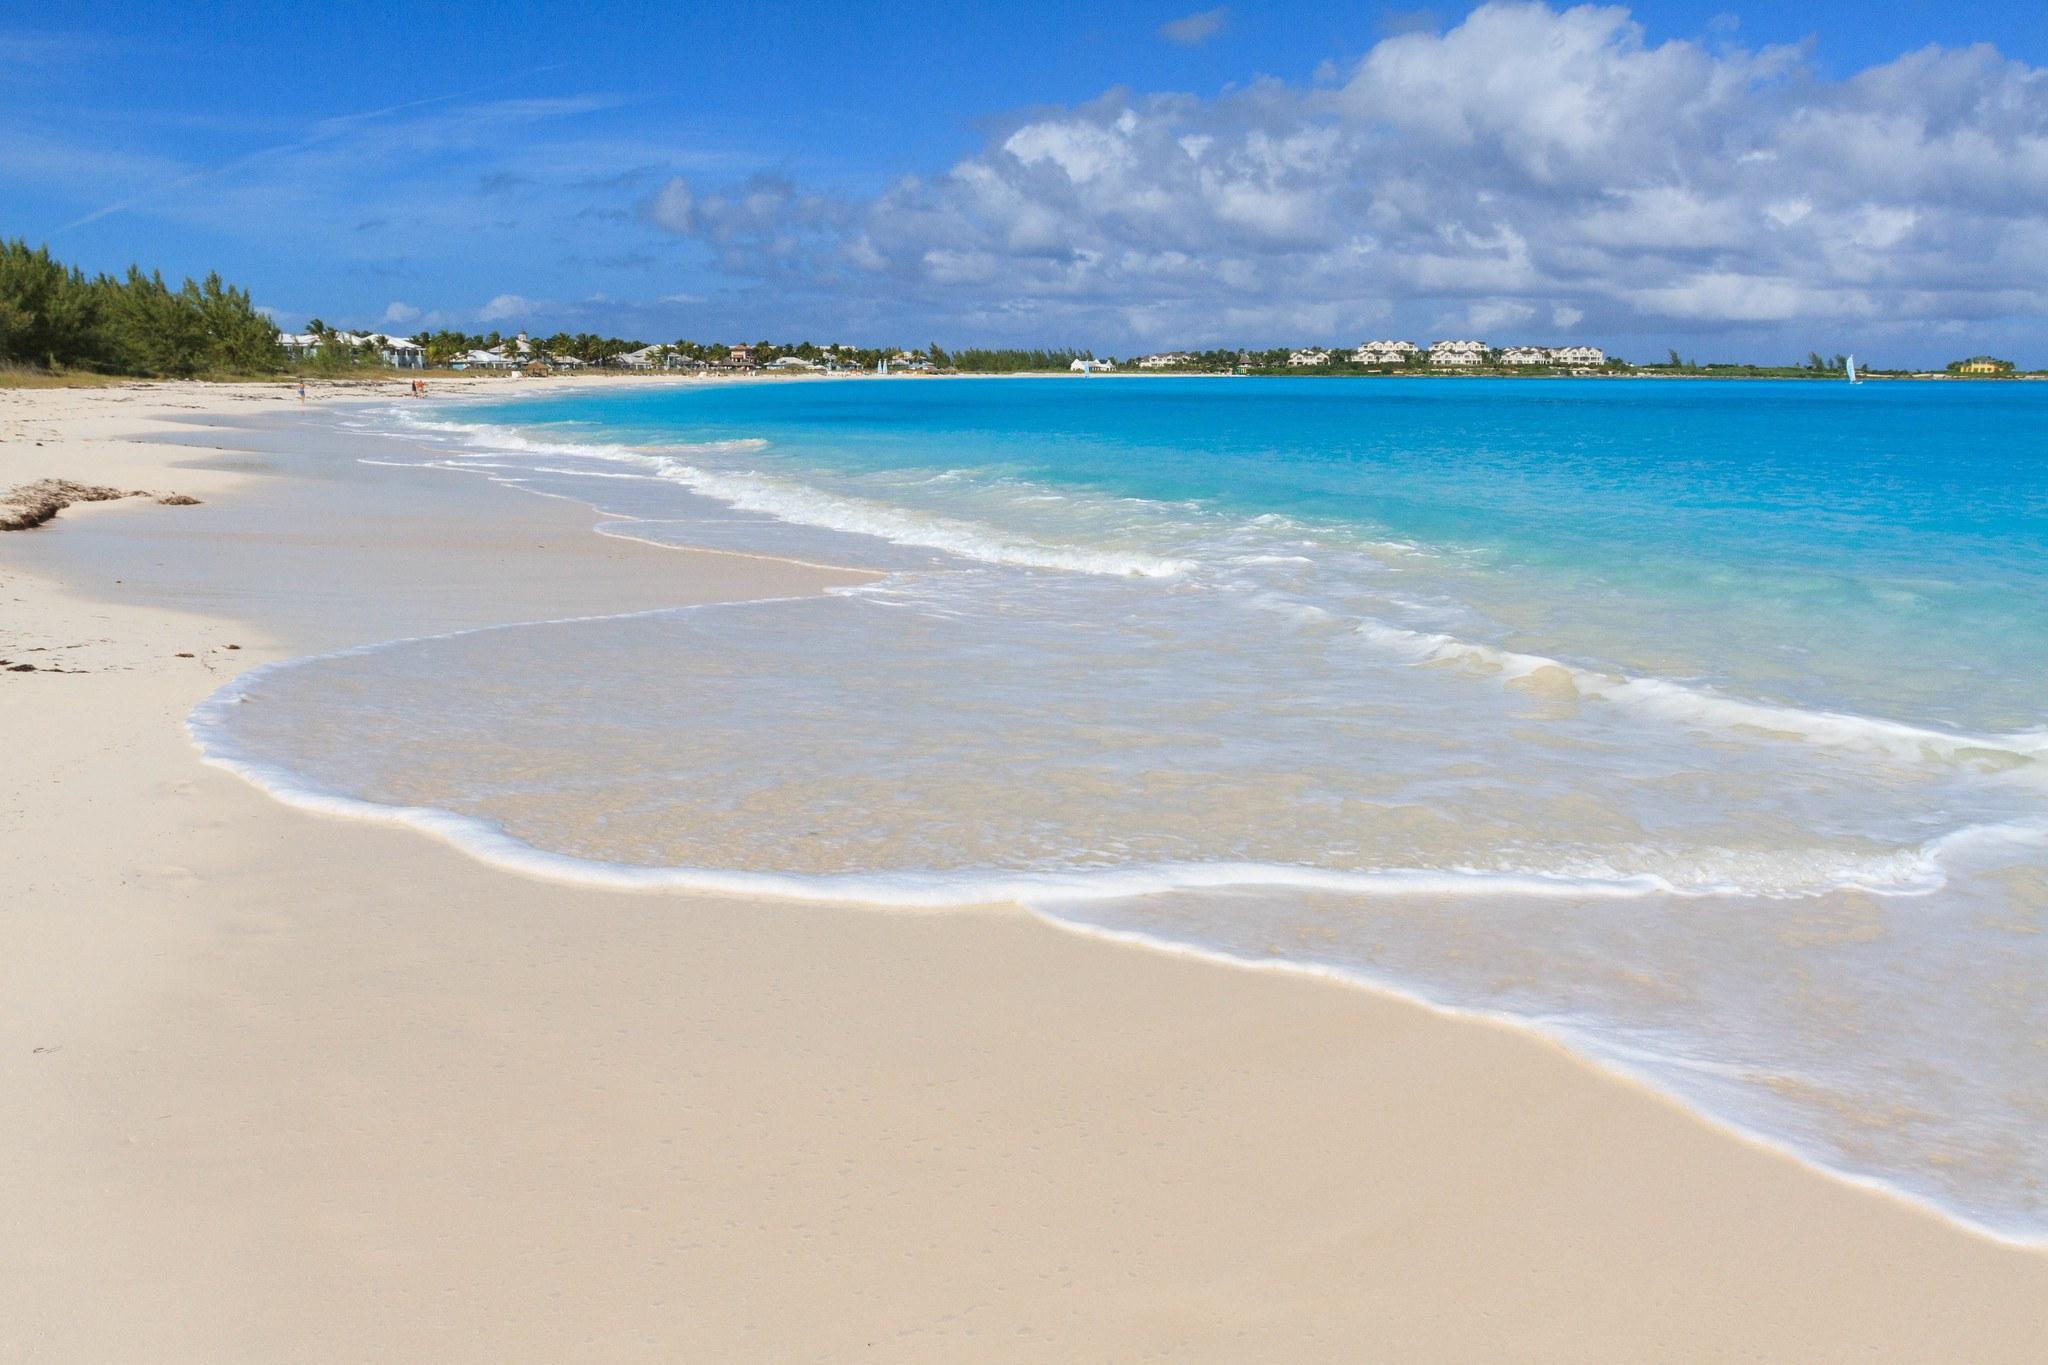 Beach at Sandals Emerald Bay